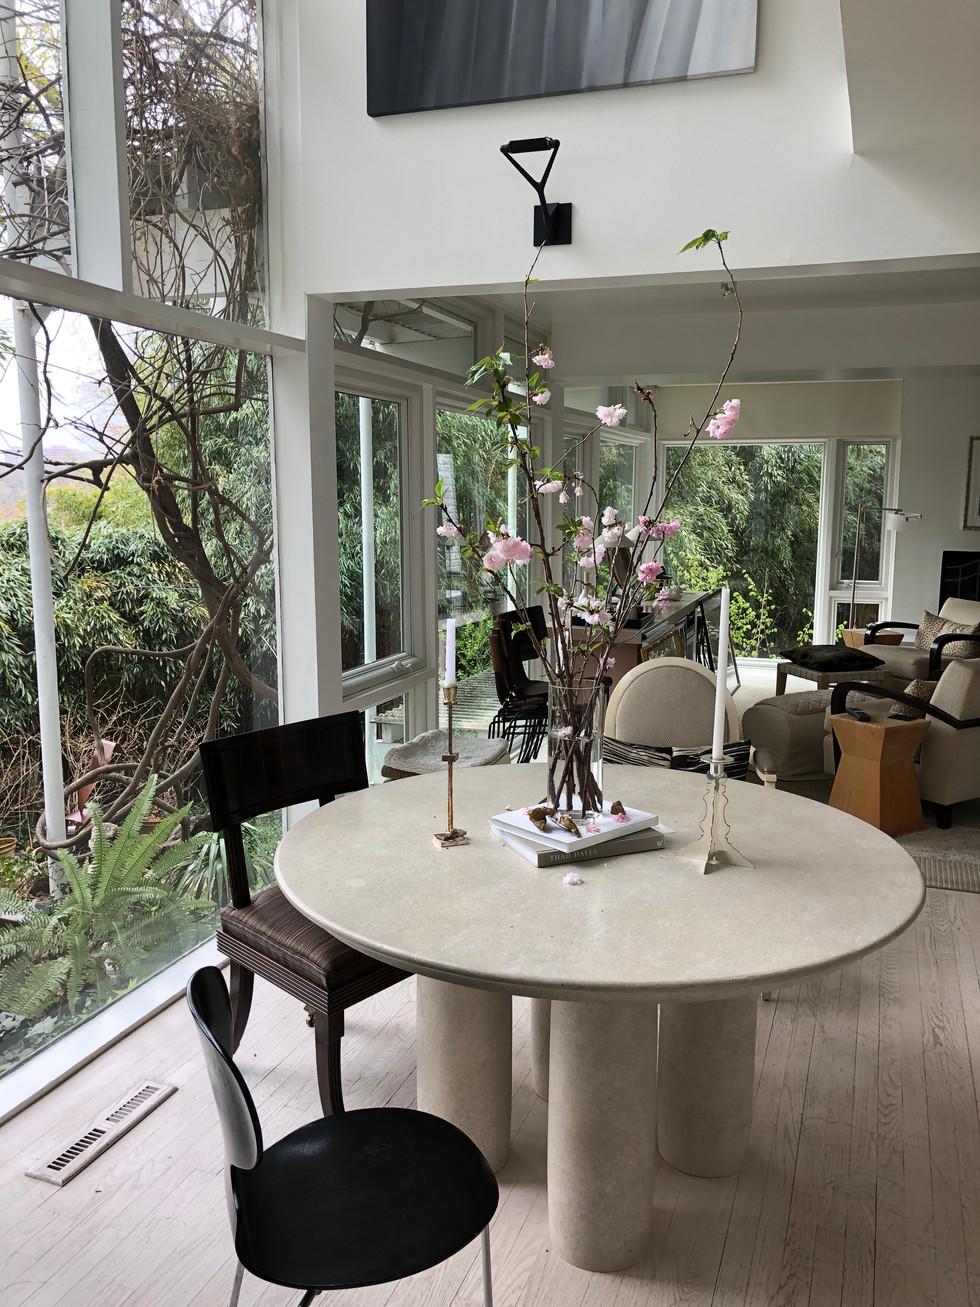 Gary's Dining Area